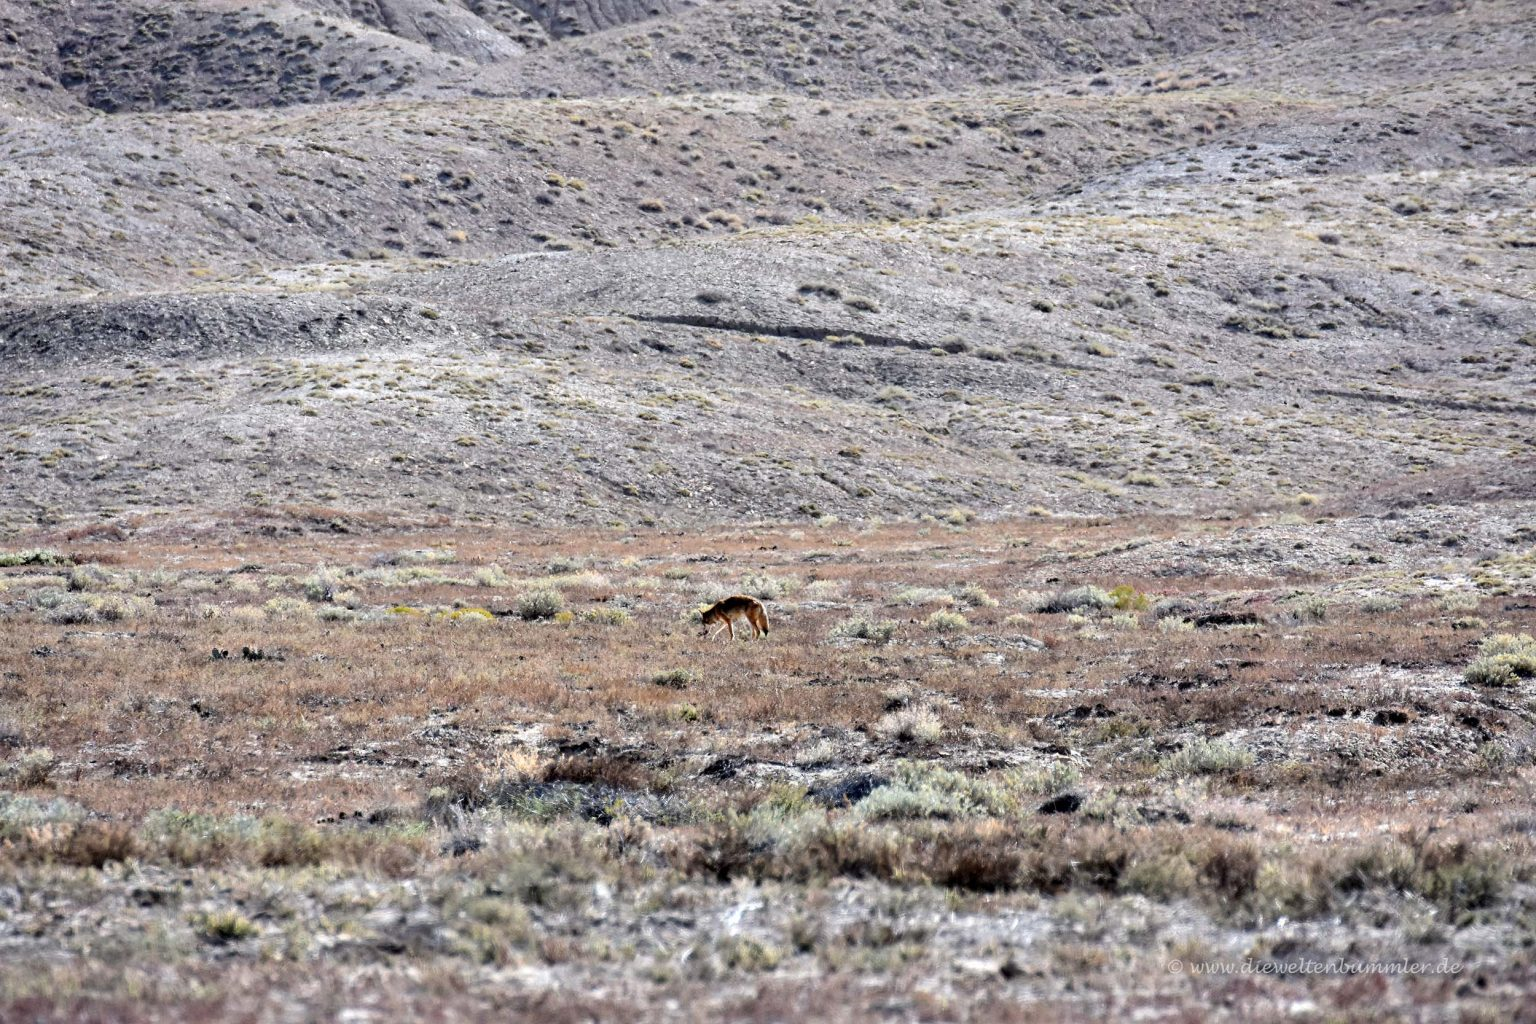 Kojote in Colorado